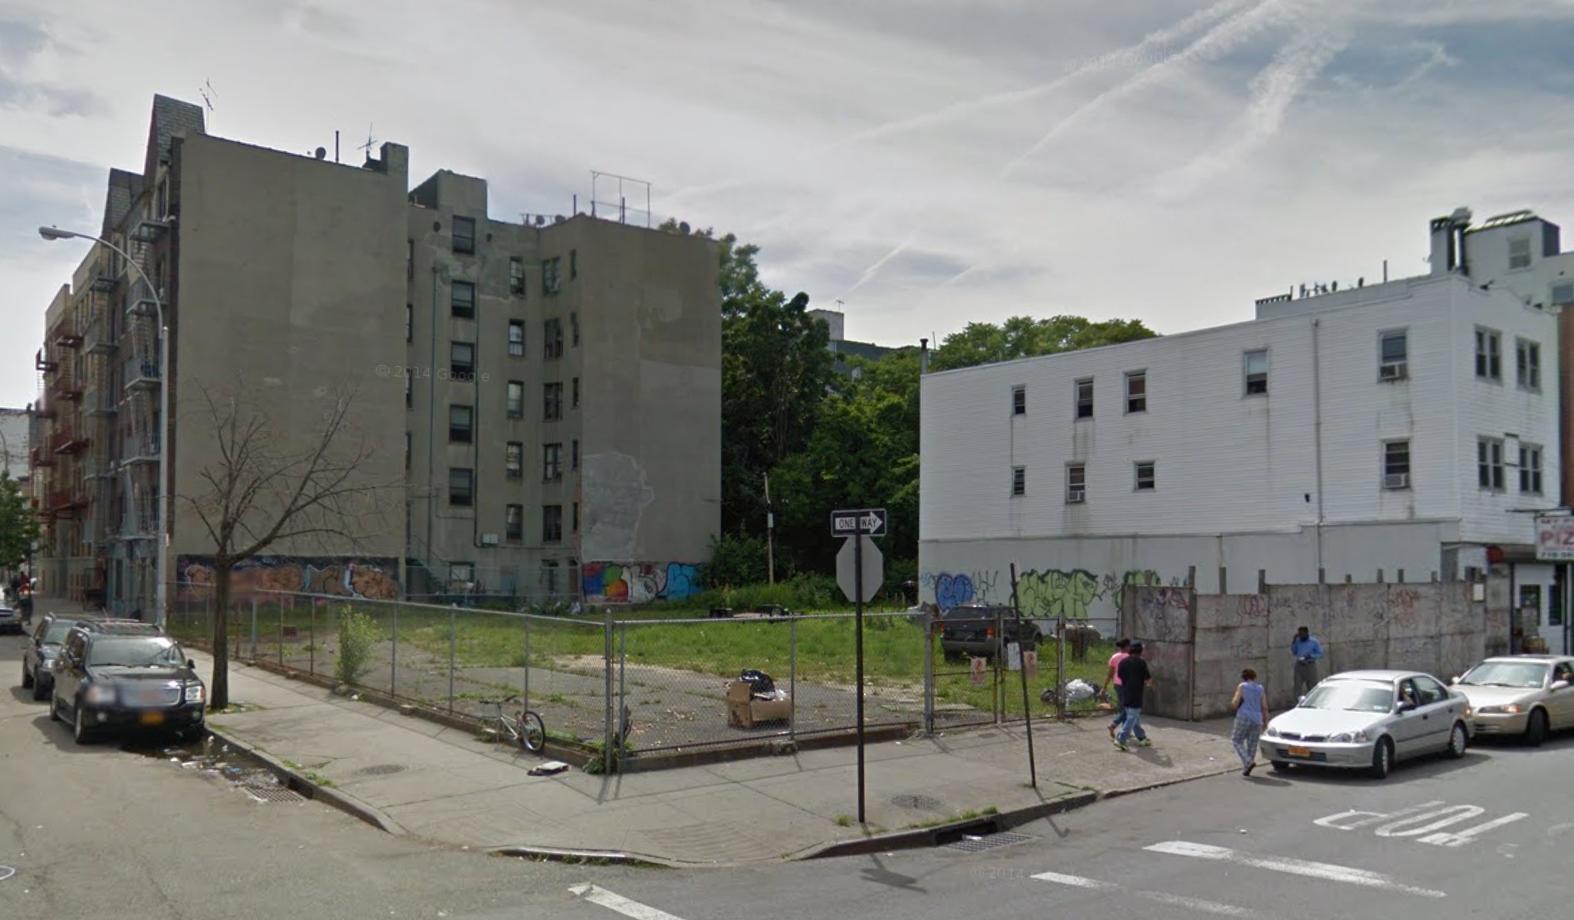 244 East 198th Street